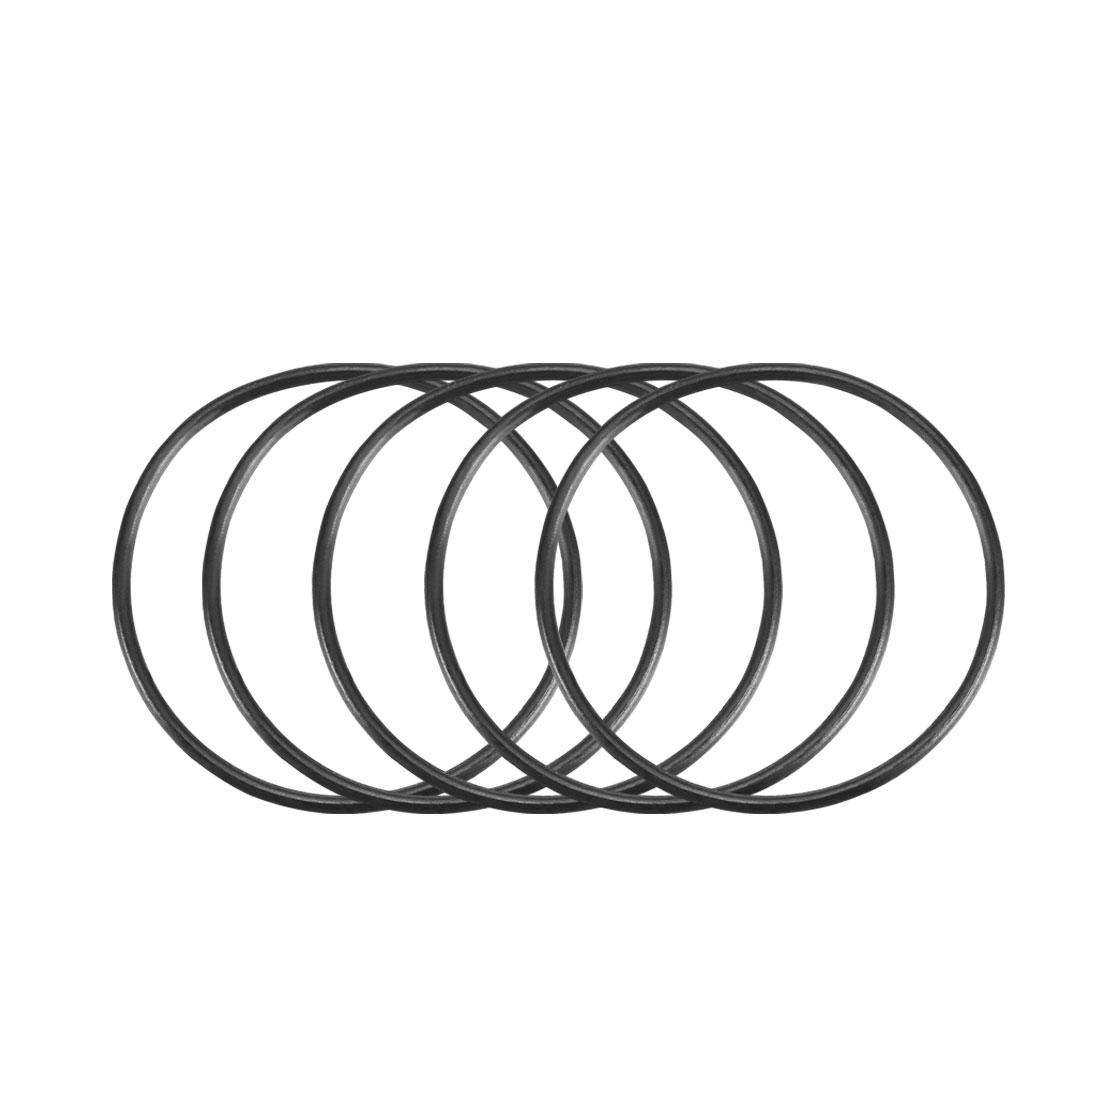 100Pcs Black 28mm x 1mm Nitrile Rubber O Ring NBR Oil Sealing Grommets